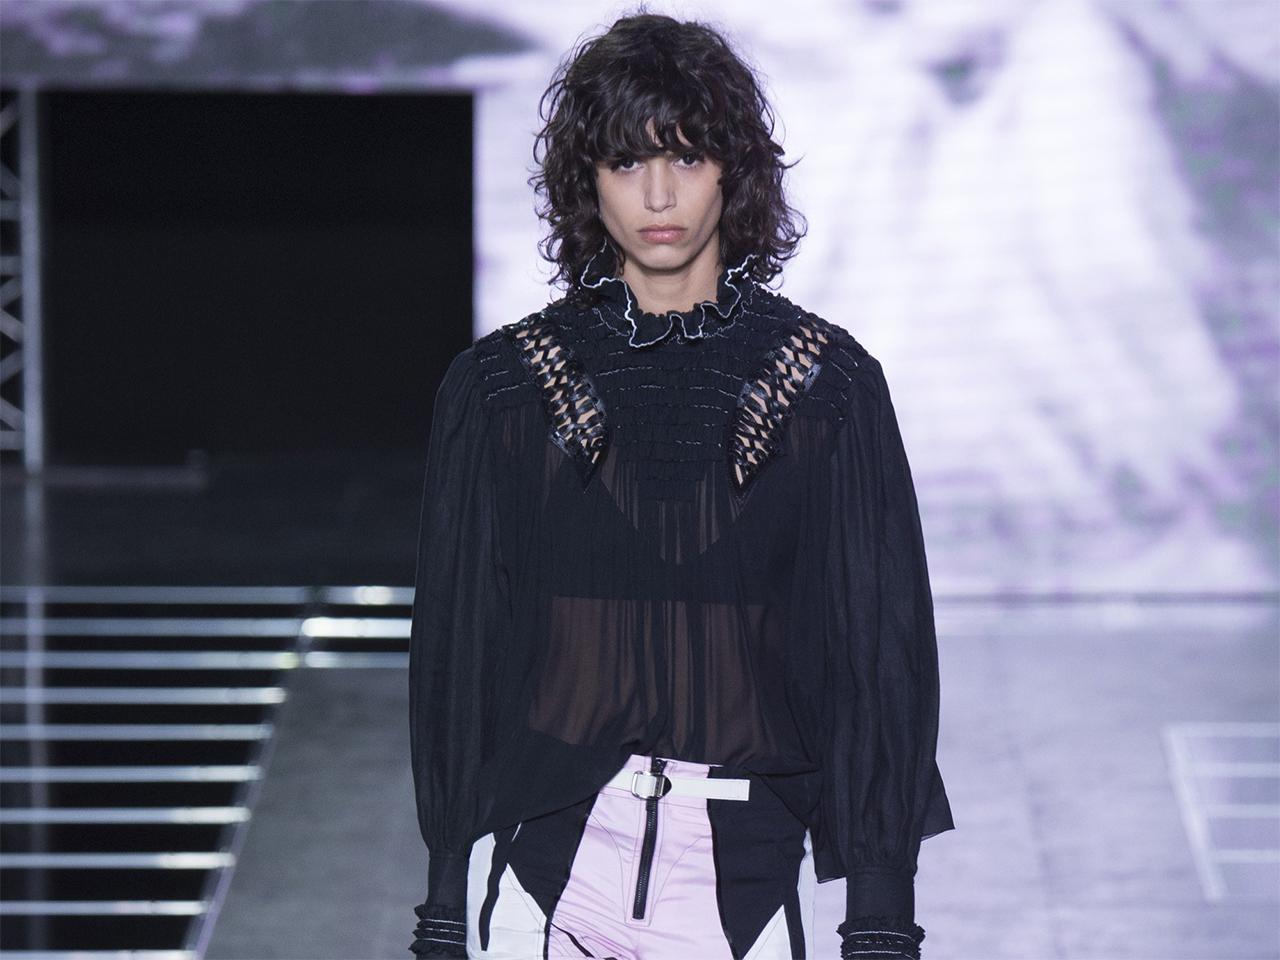 Designer: Louis Vuitton